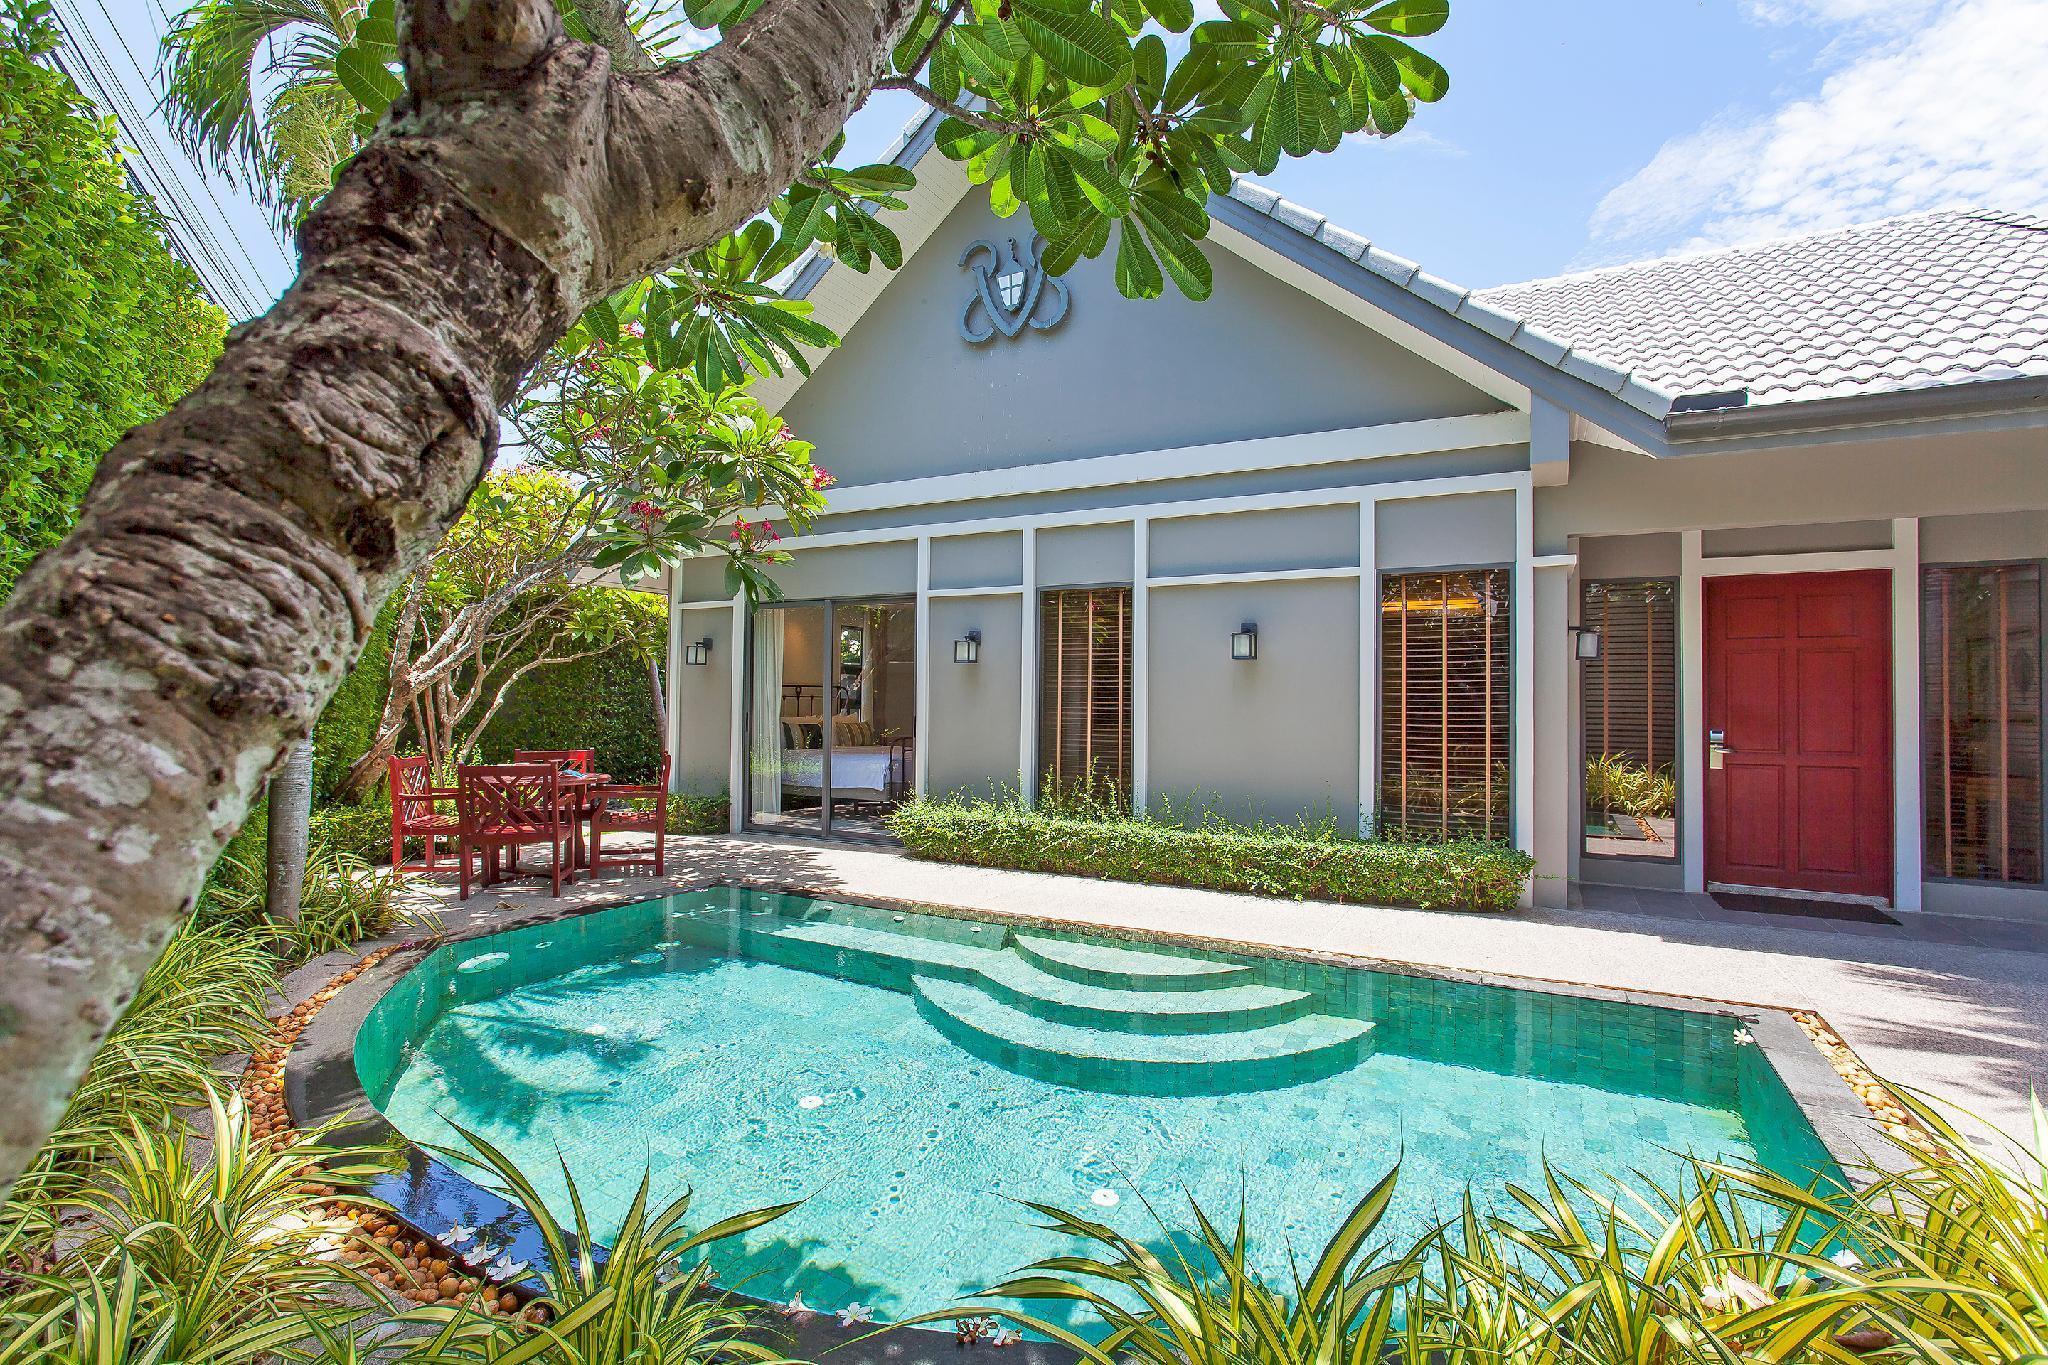 ⭐3BR Modern Pool Villa 2km to Beach & Walking St ⭐3BR Modern Pool Villa 2km to Beach & Walking St